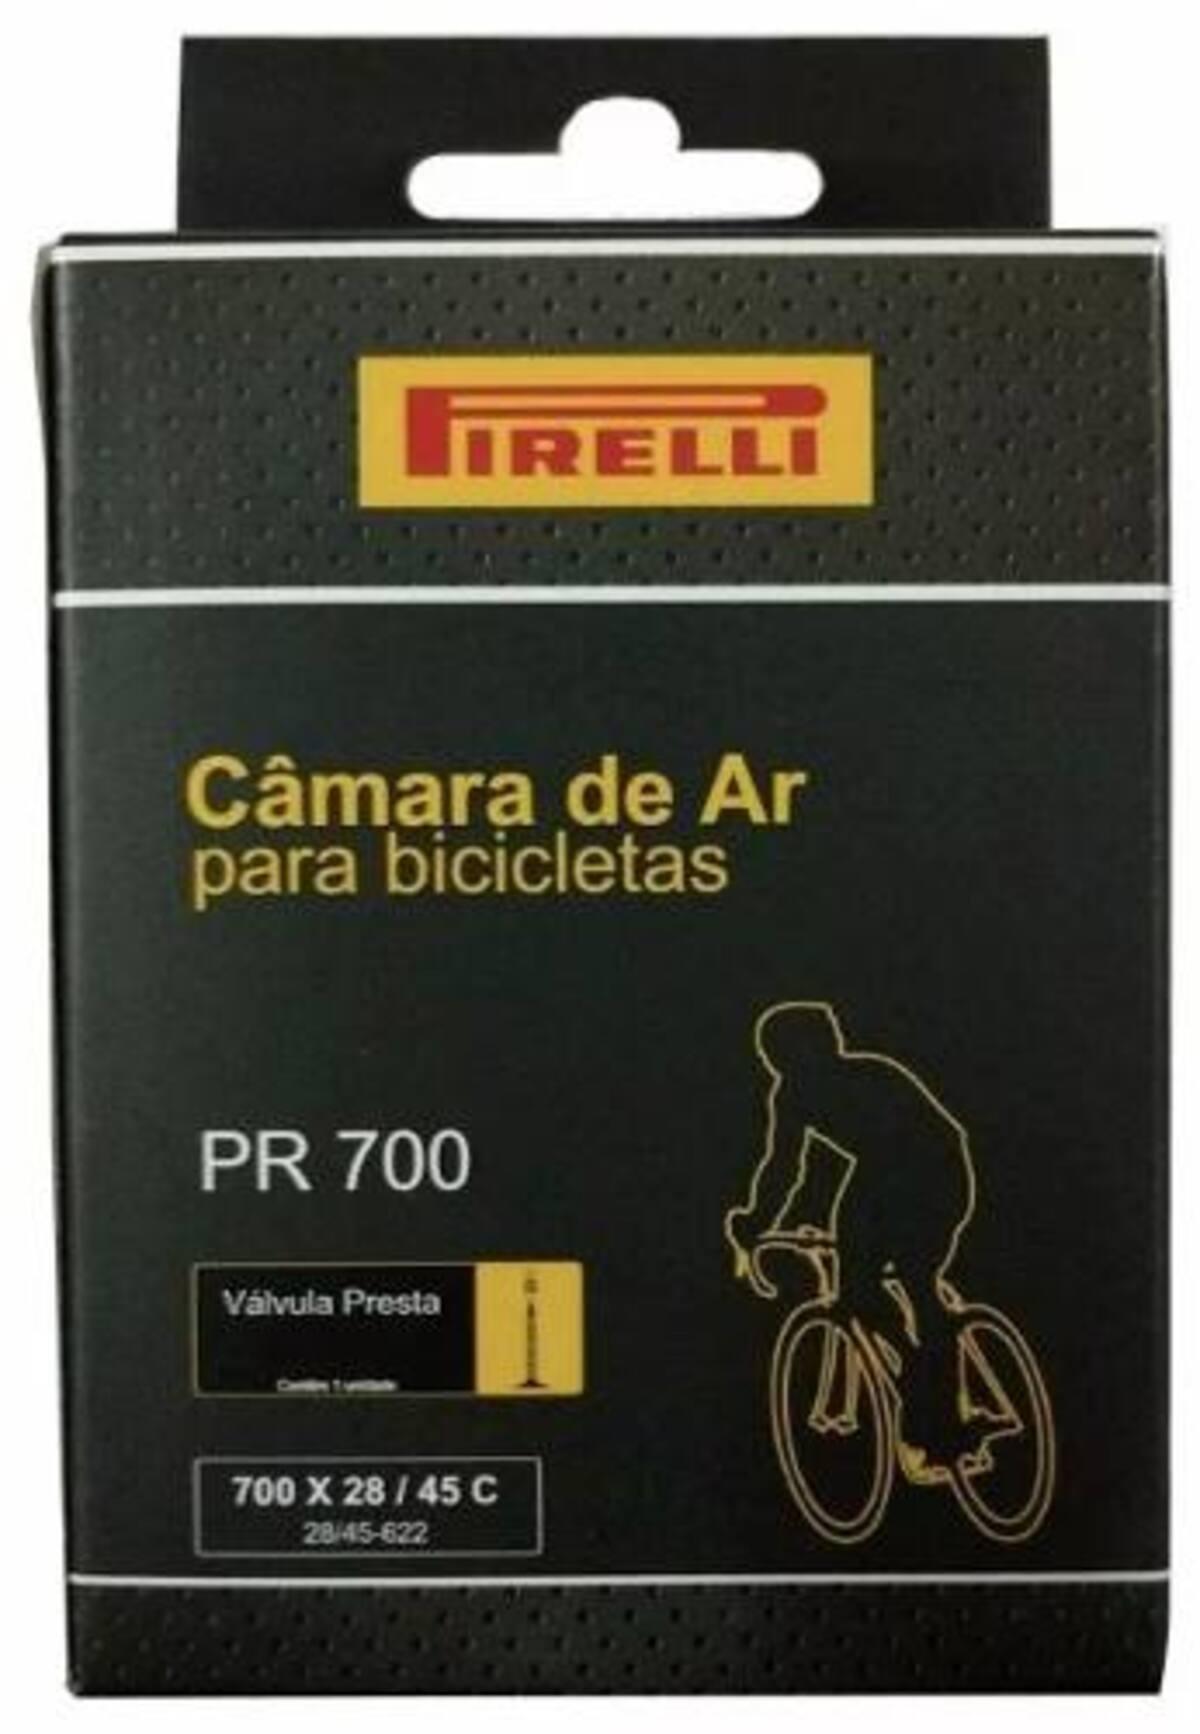 Kit Pneu Pirelli Phantom Street Aramado 700x38 com Câmara Pirelli 700